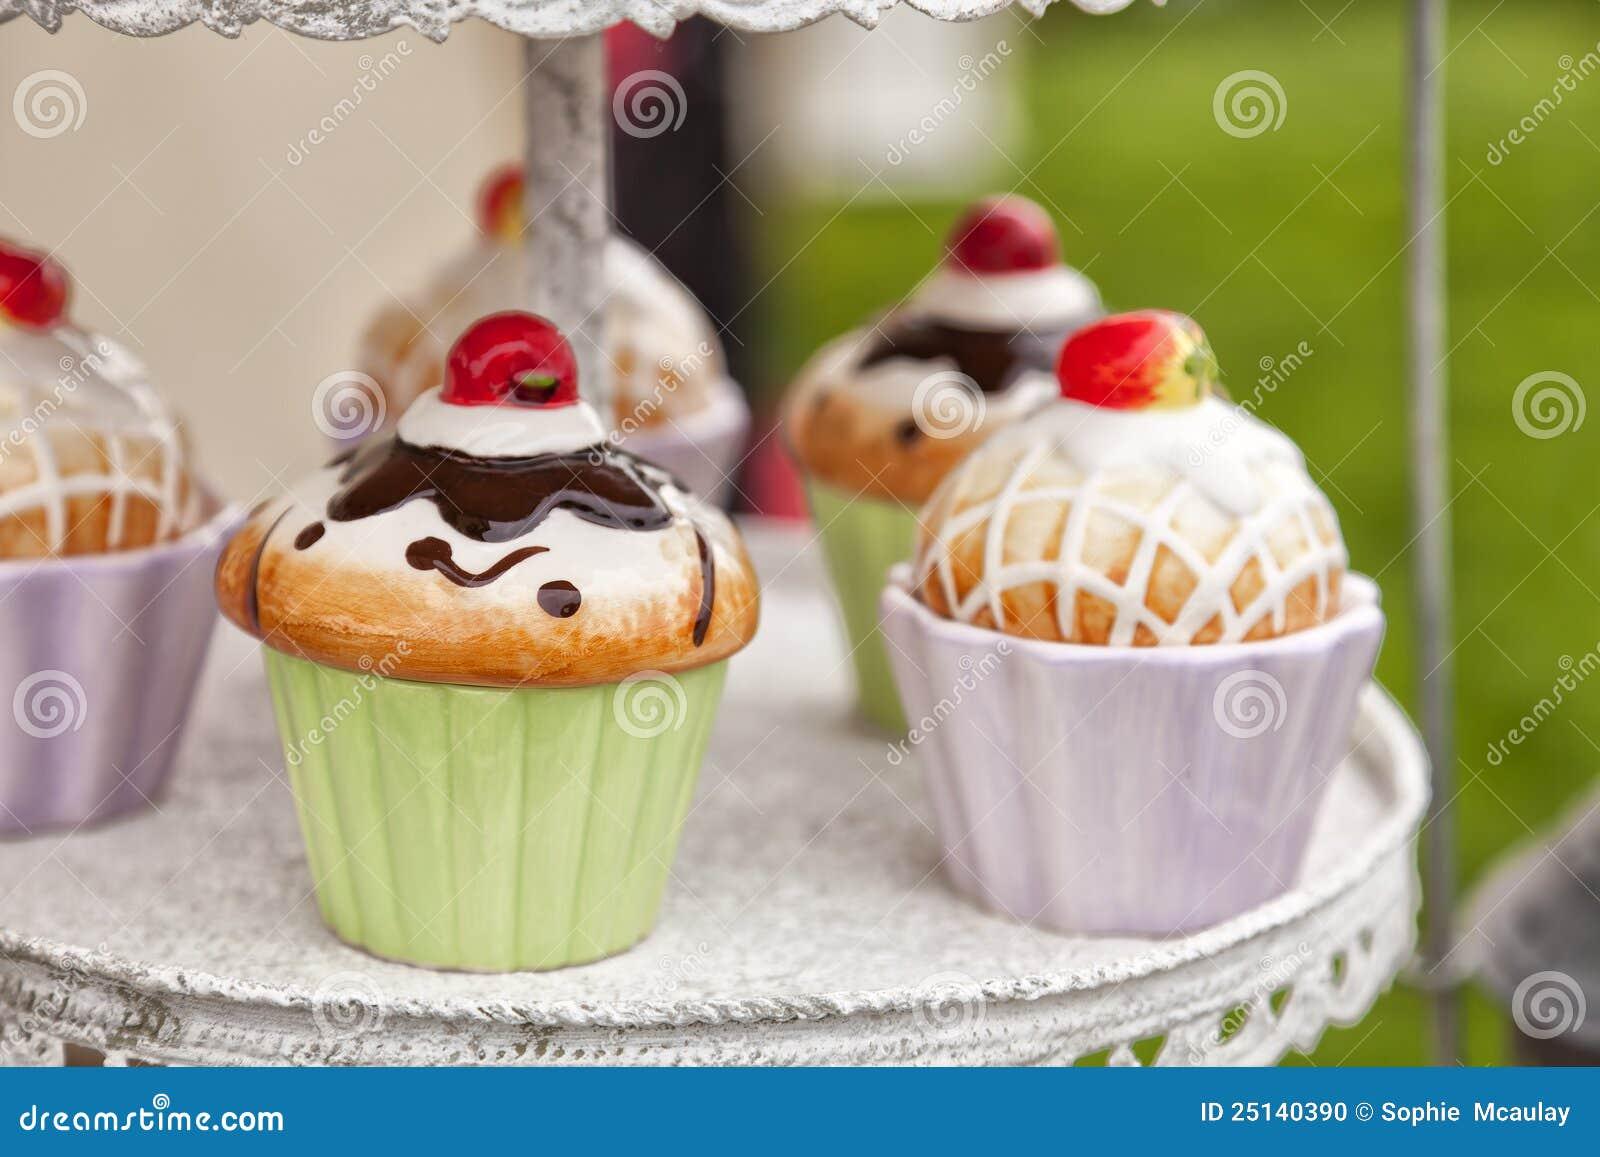 Ceramic Cupcake Containers Stock Photo Image Of Dessert